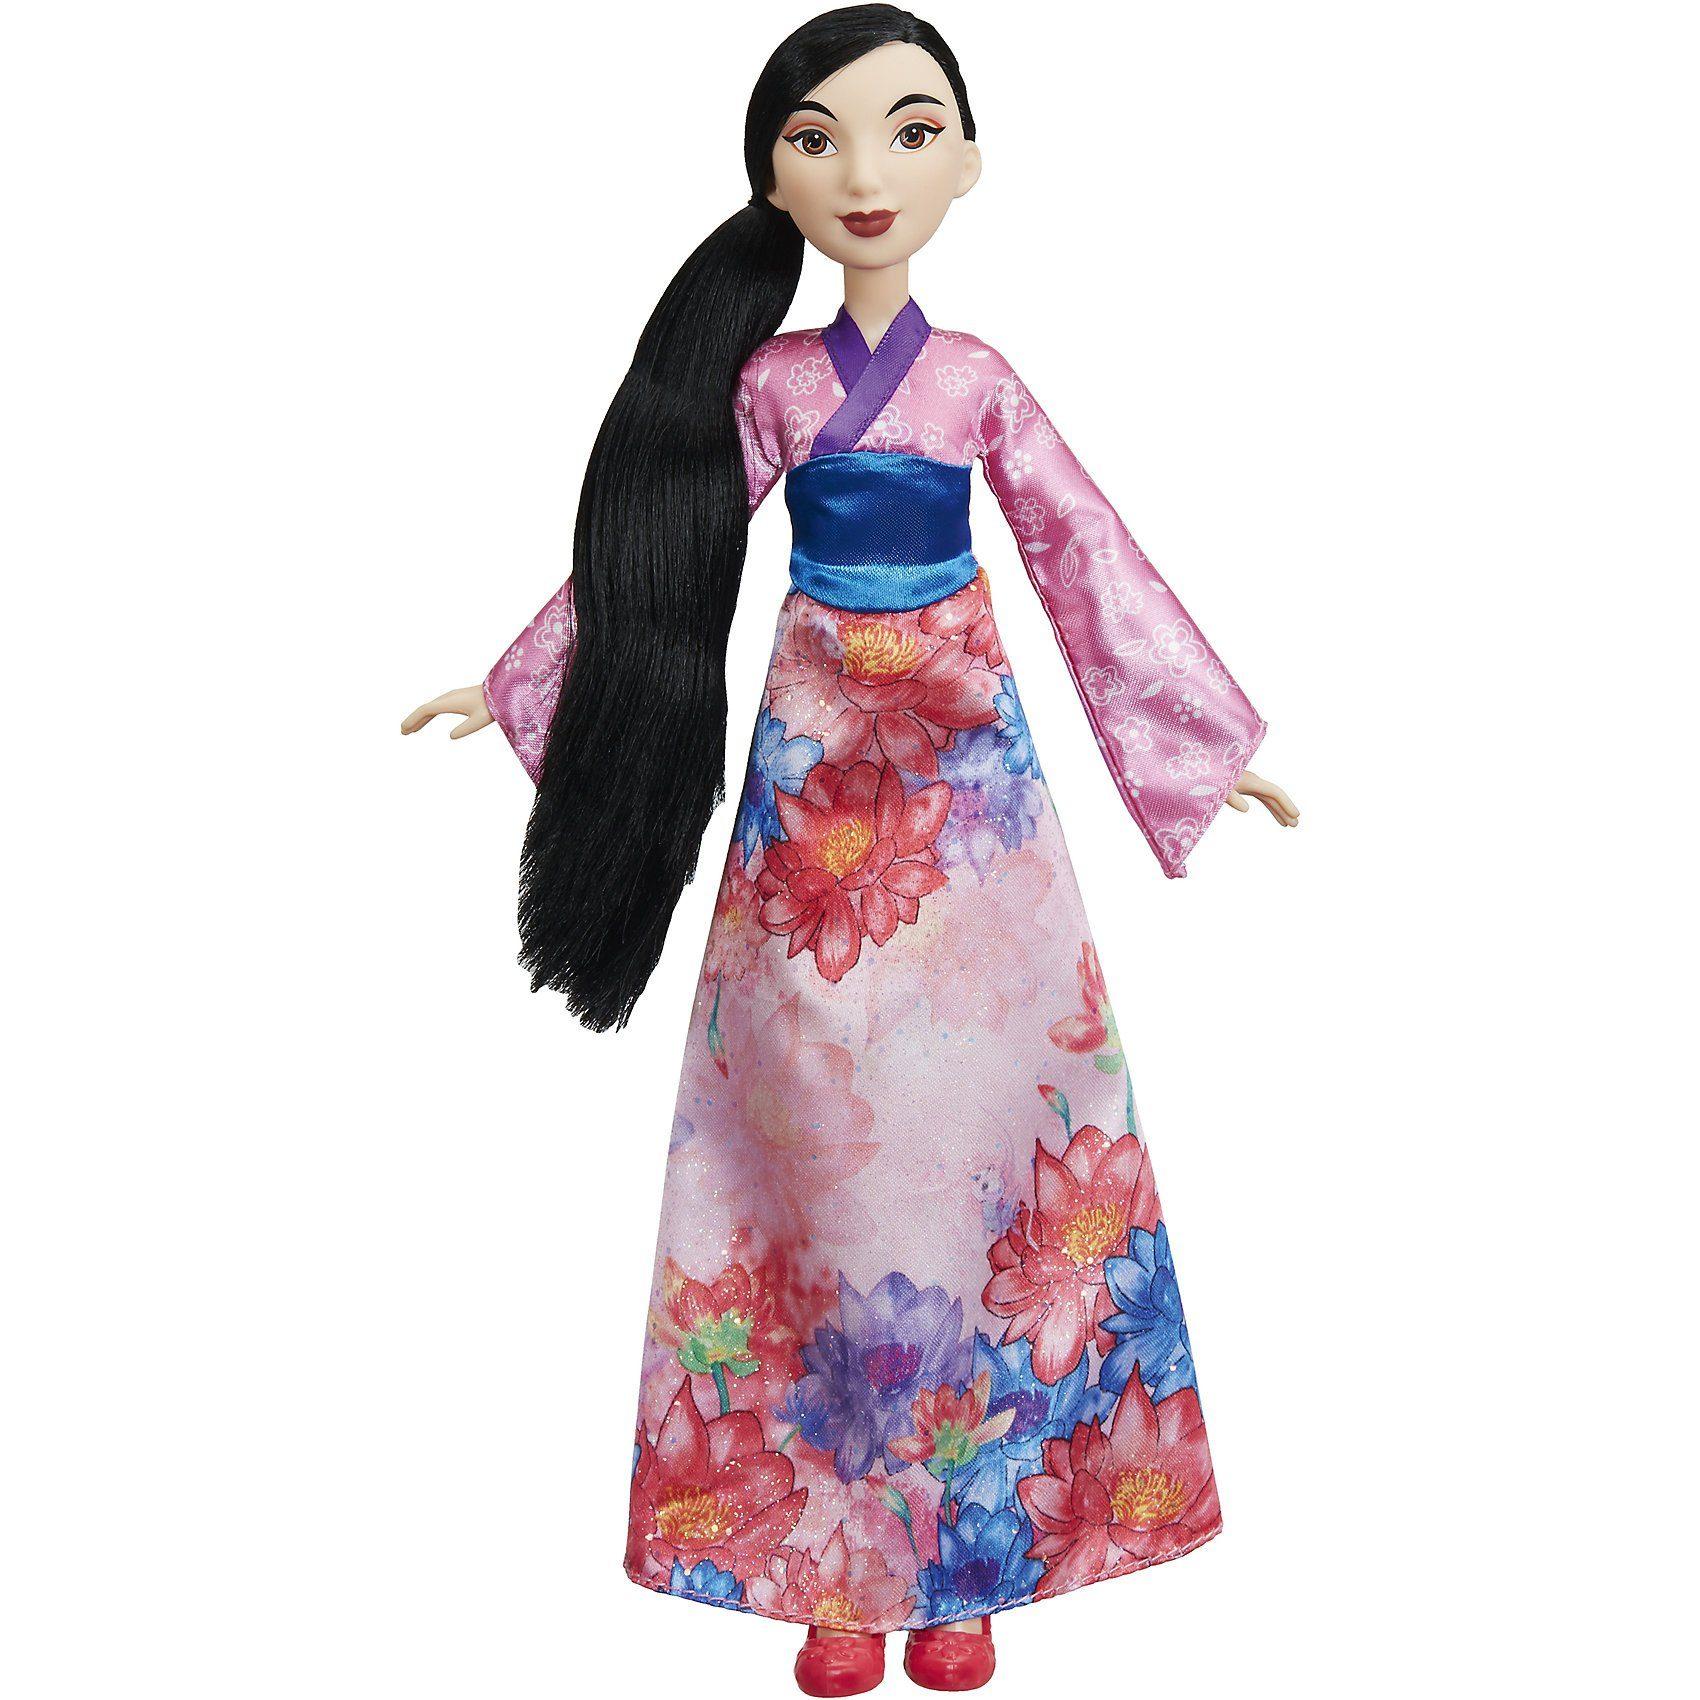 Hasbro Disney Prinzessin Schimmerglanz Mulan